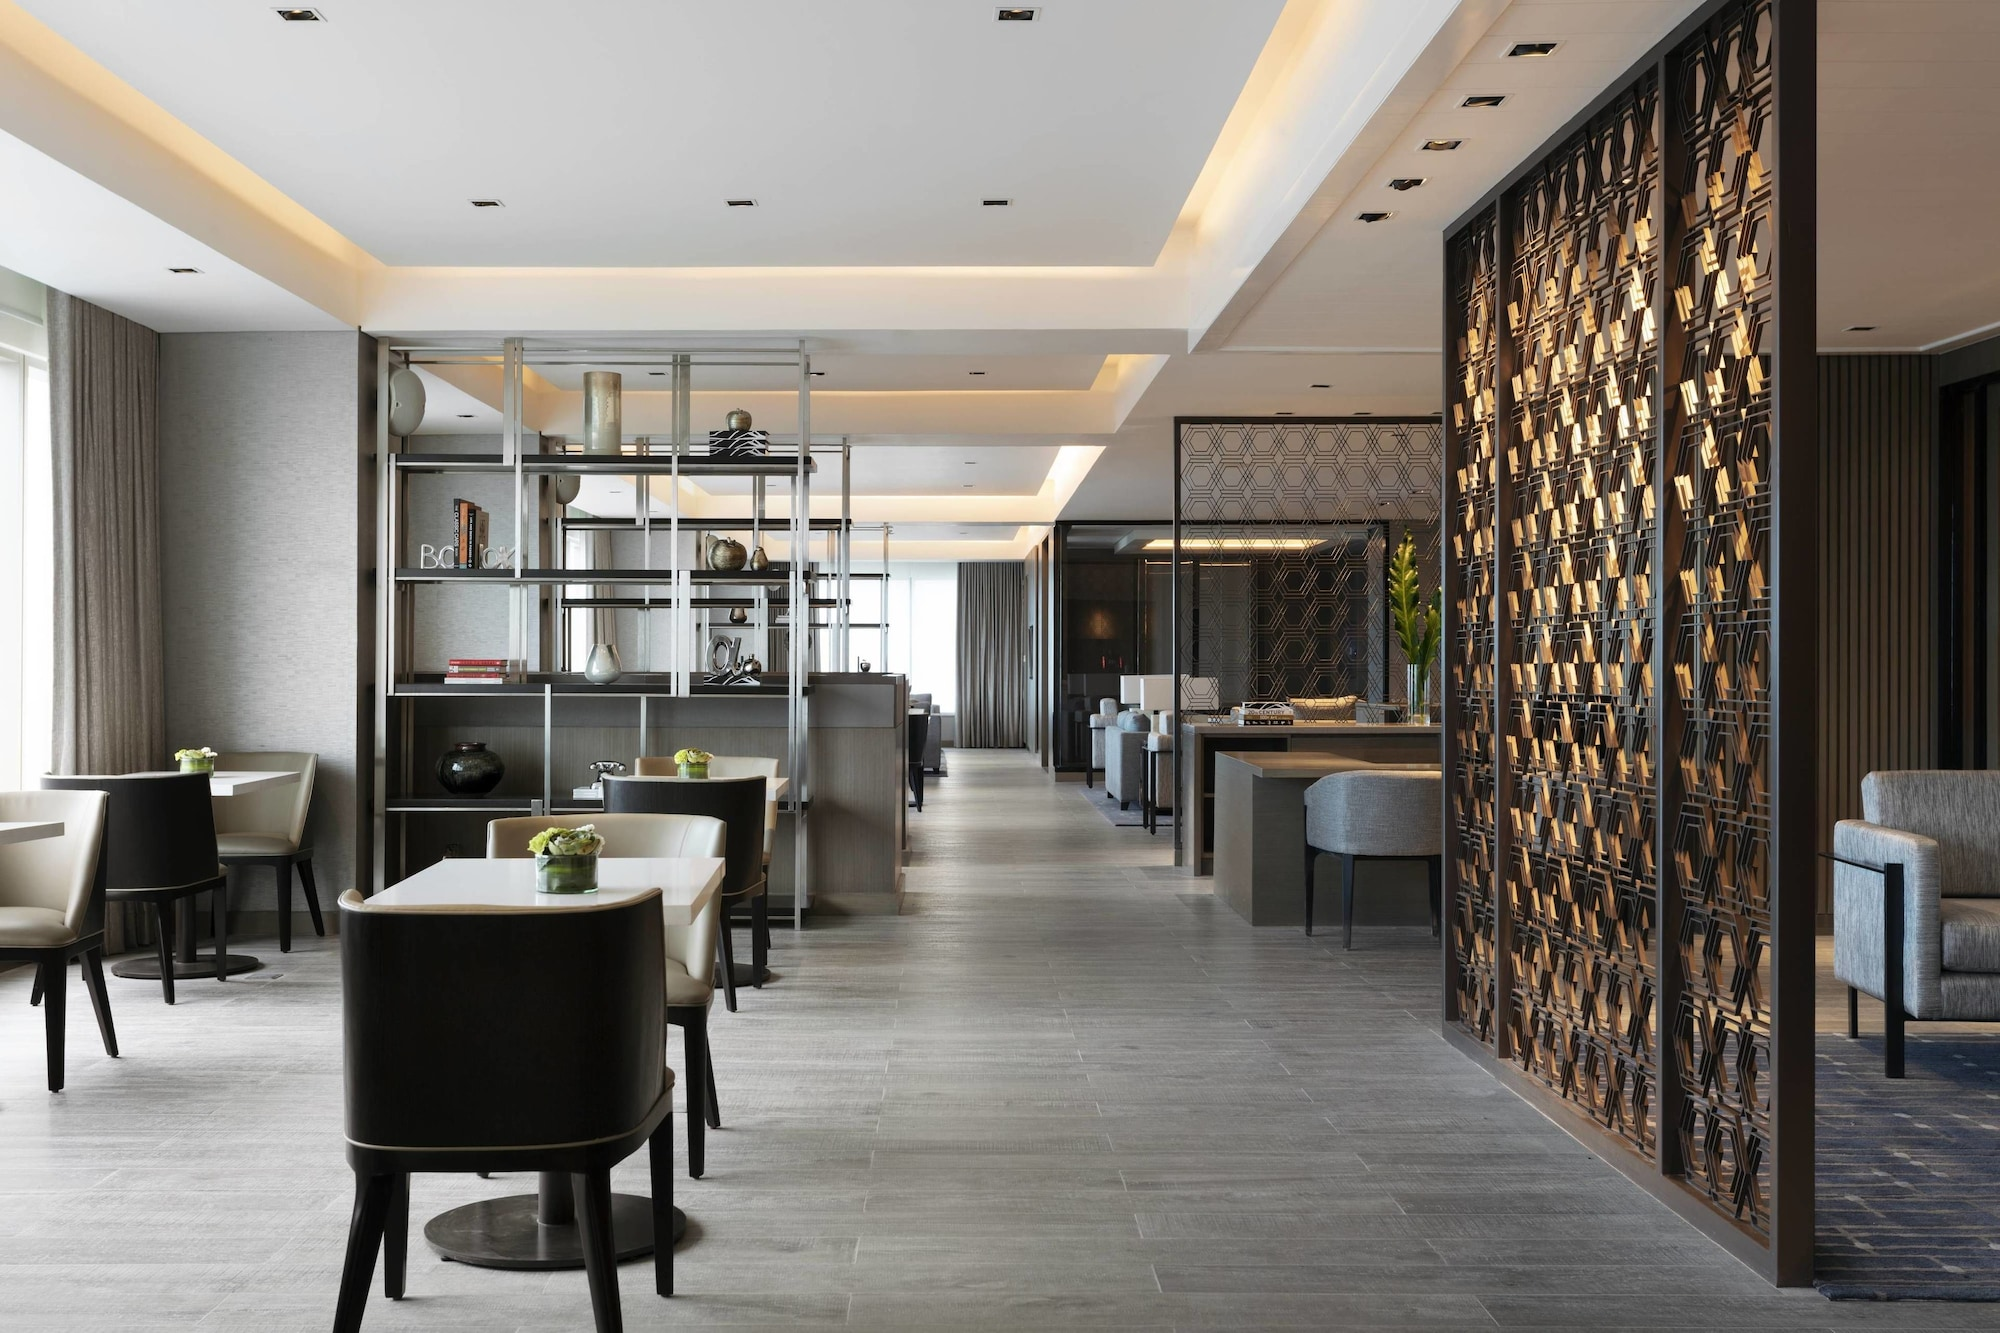 Clark Marriott Hotel, Mabalacat